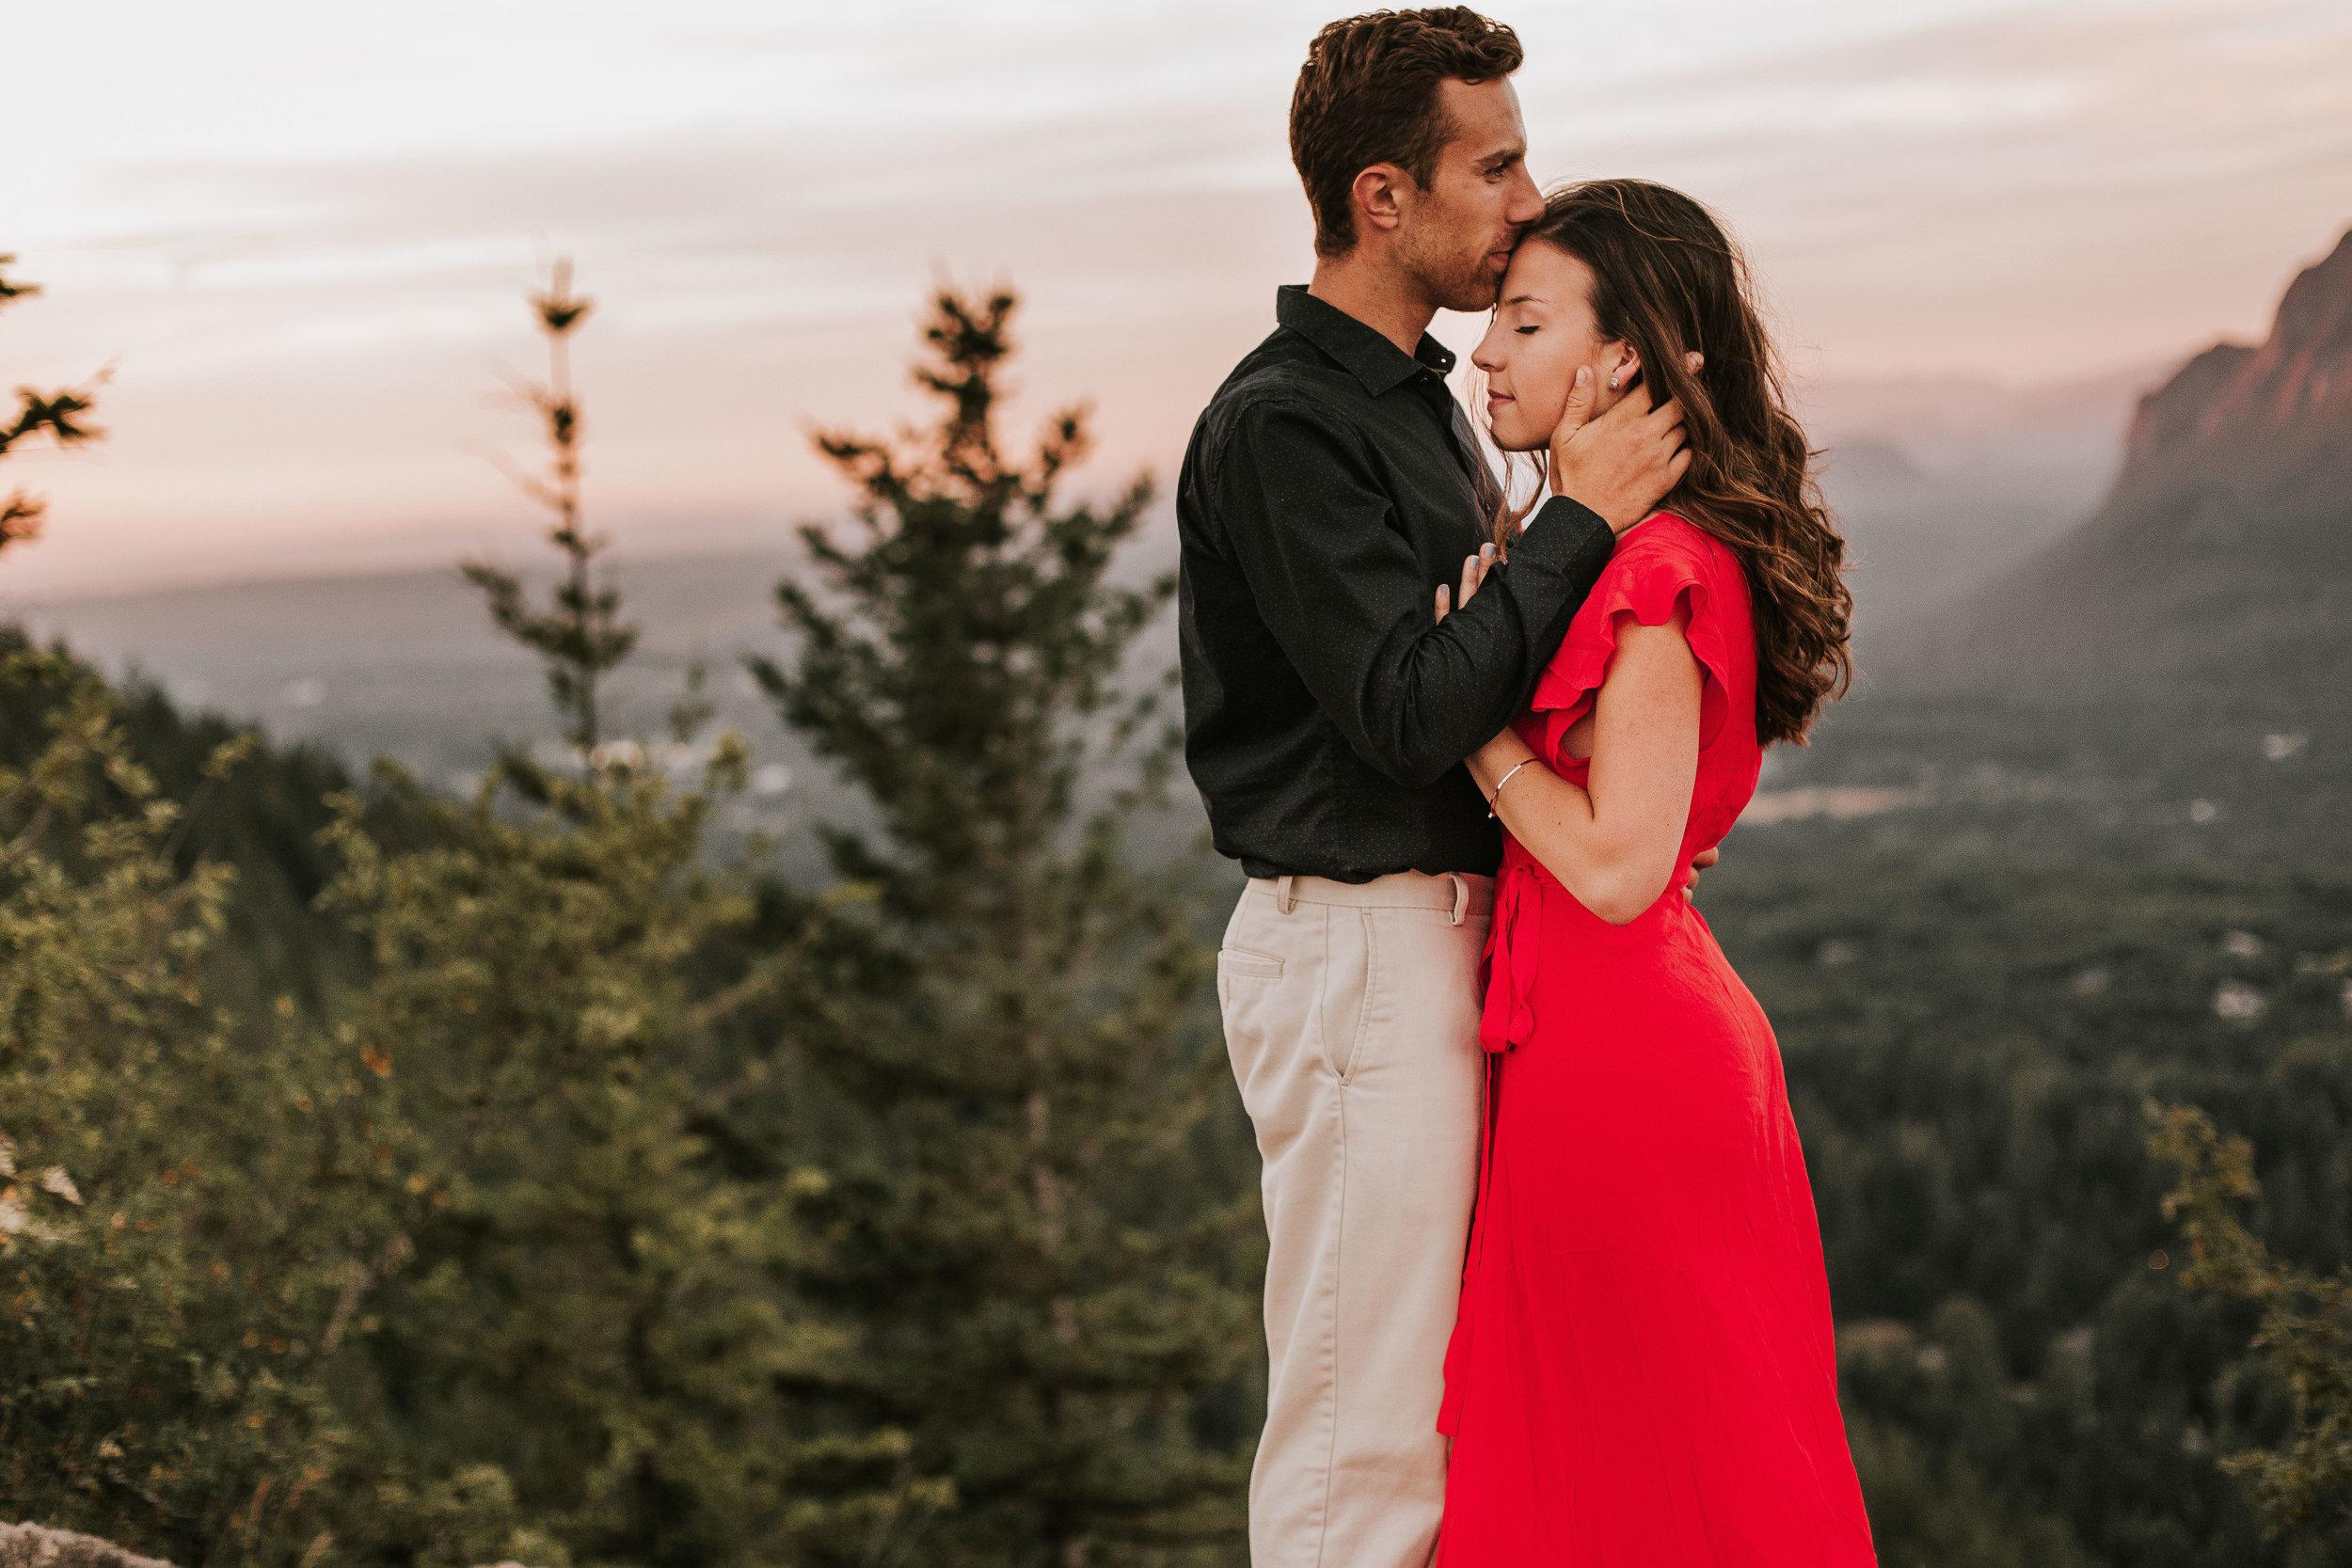 nicole-daacke-photography-rattlesnake-ridge-adventurous-engagement-session-hiking-seattle-washington-destinatino-elopement-intimate-wedding-photographer-23.jpg